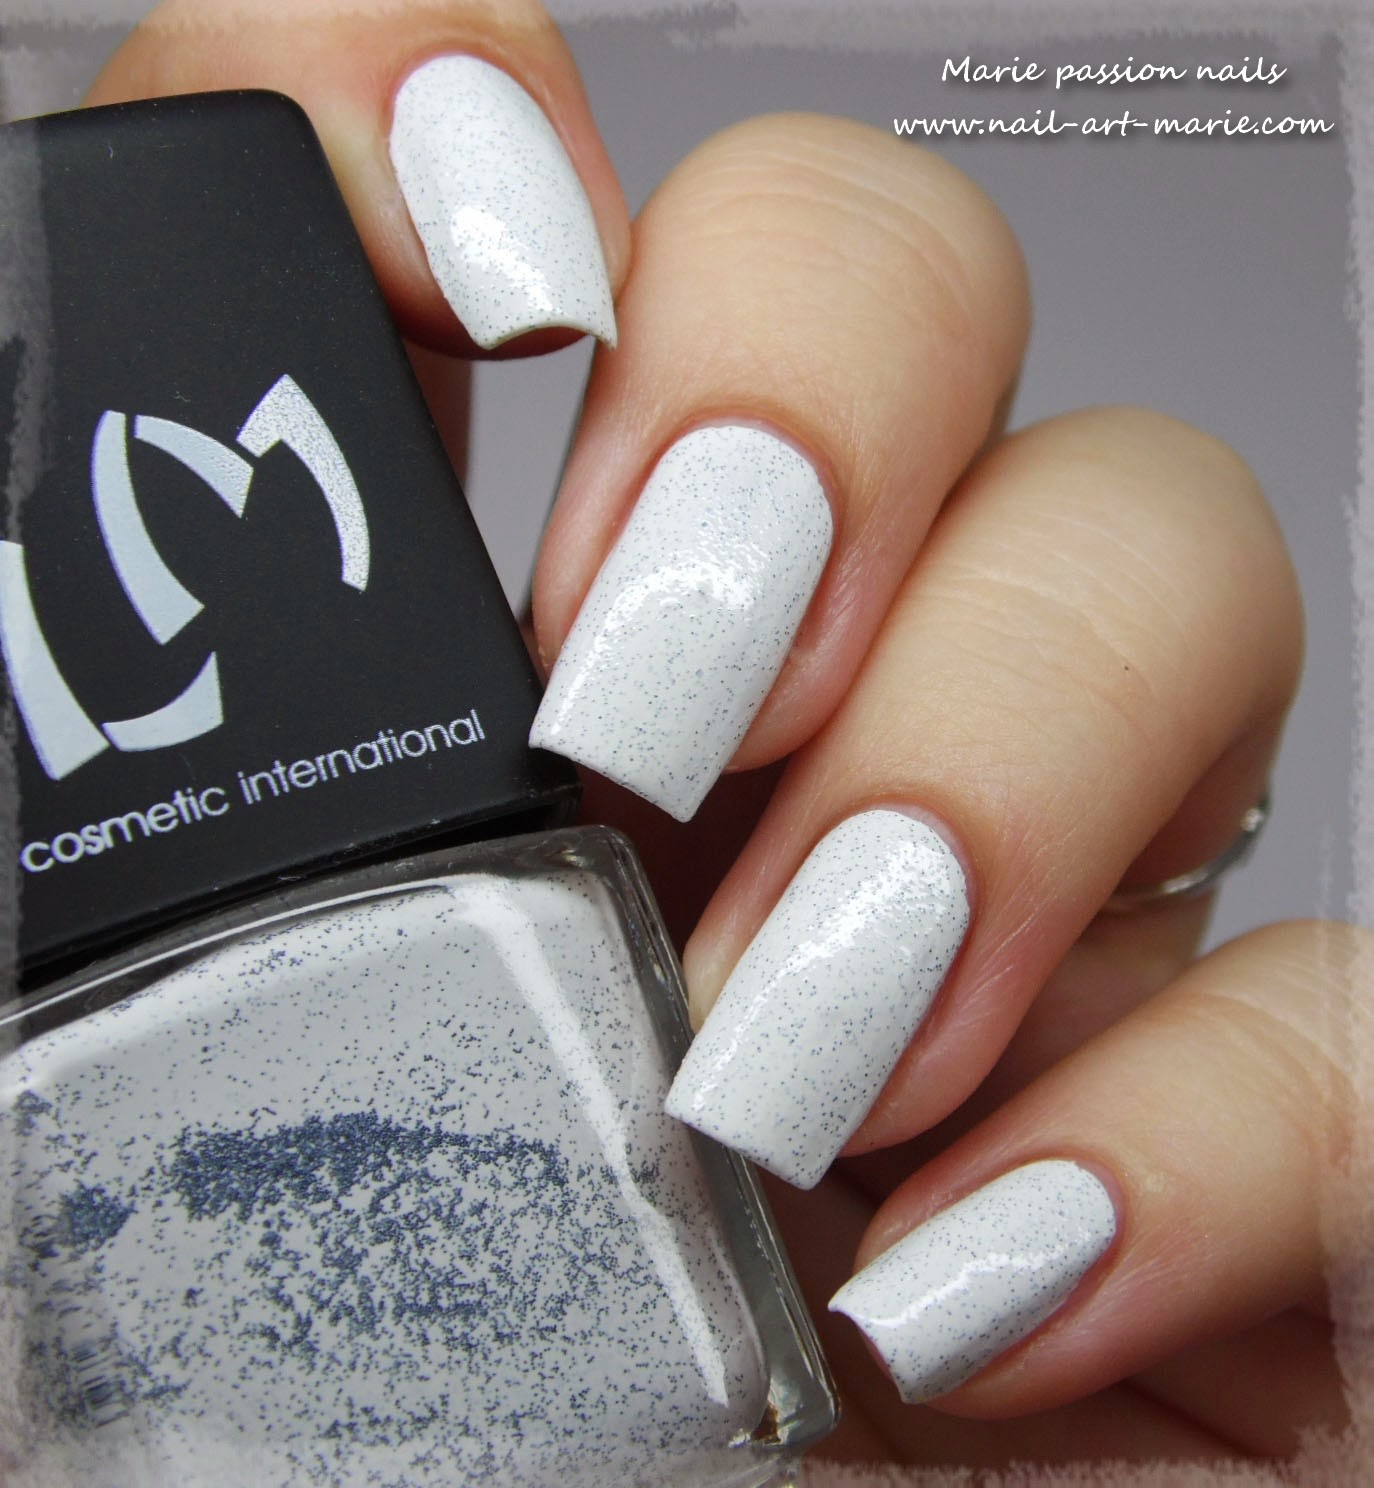 Lm Cosmetic Azul Cristal5